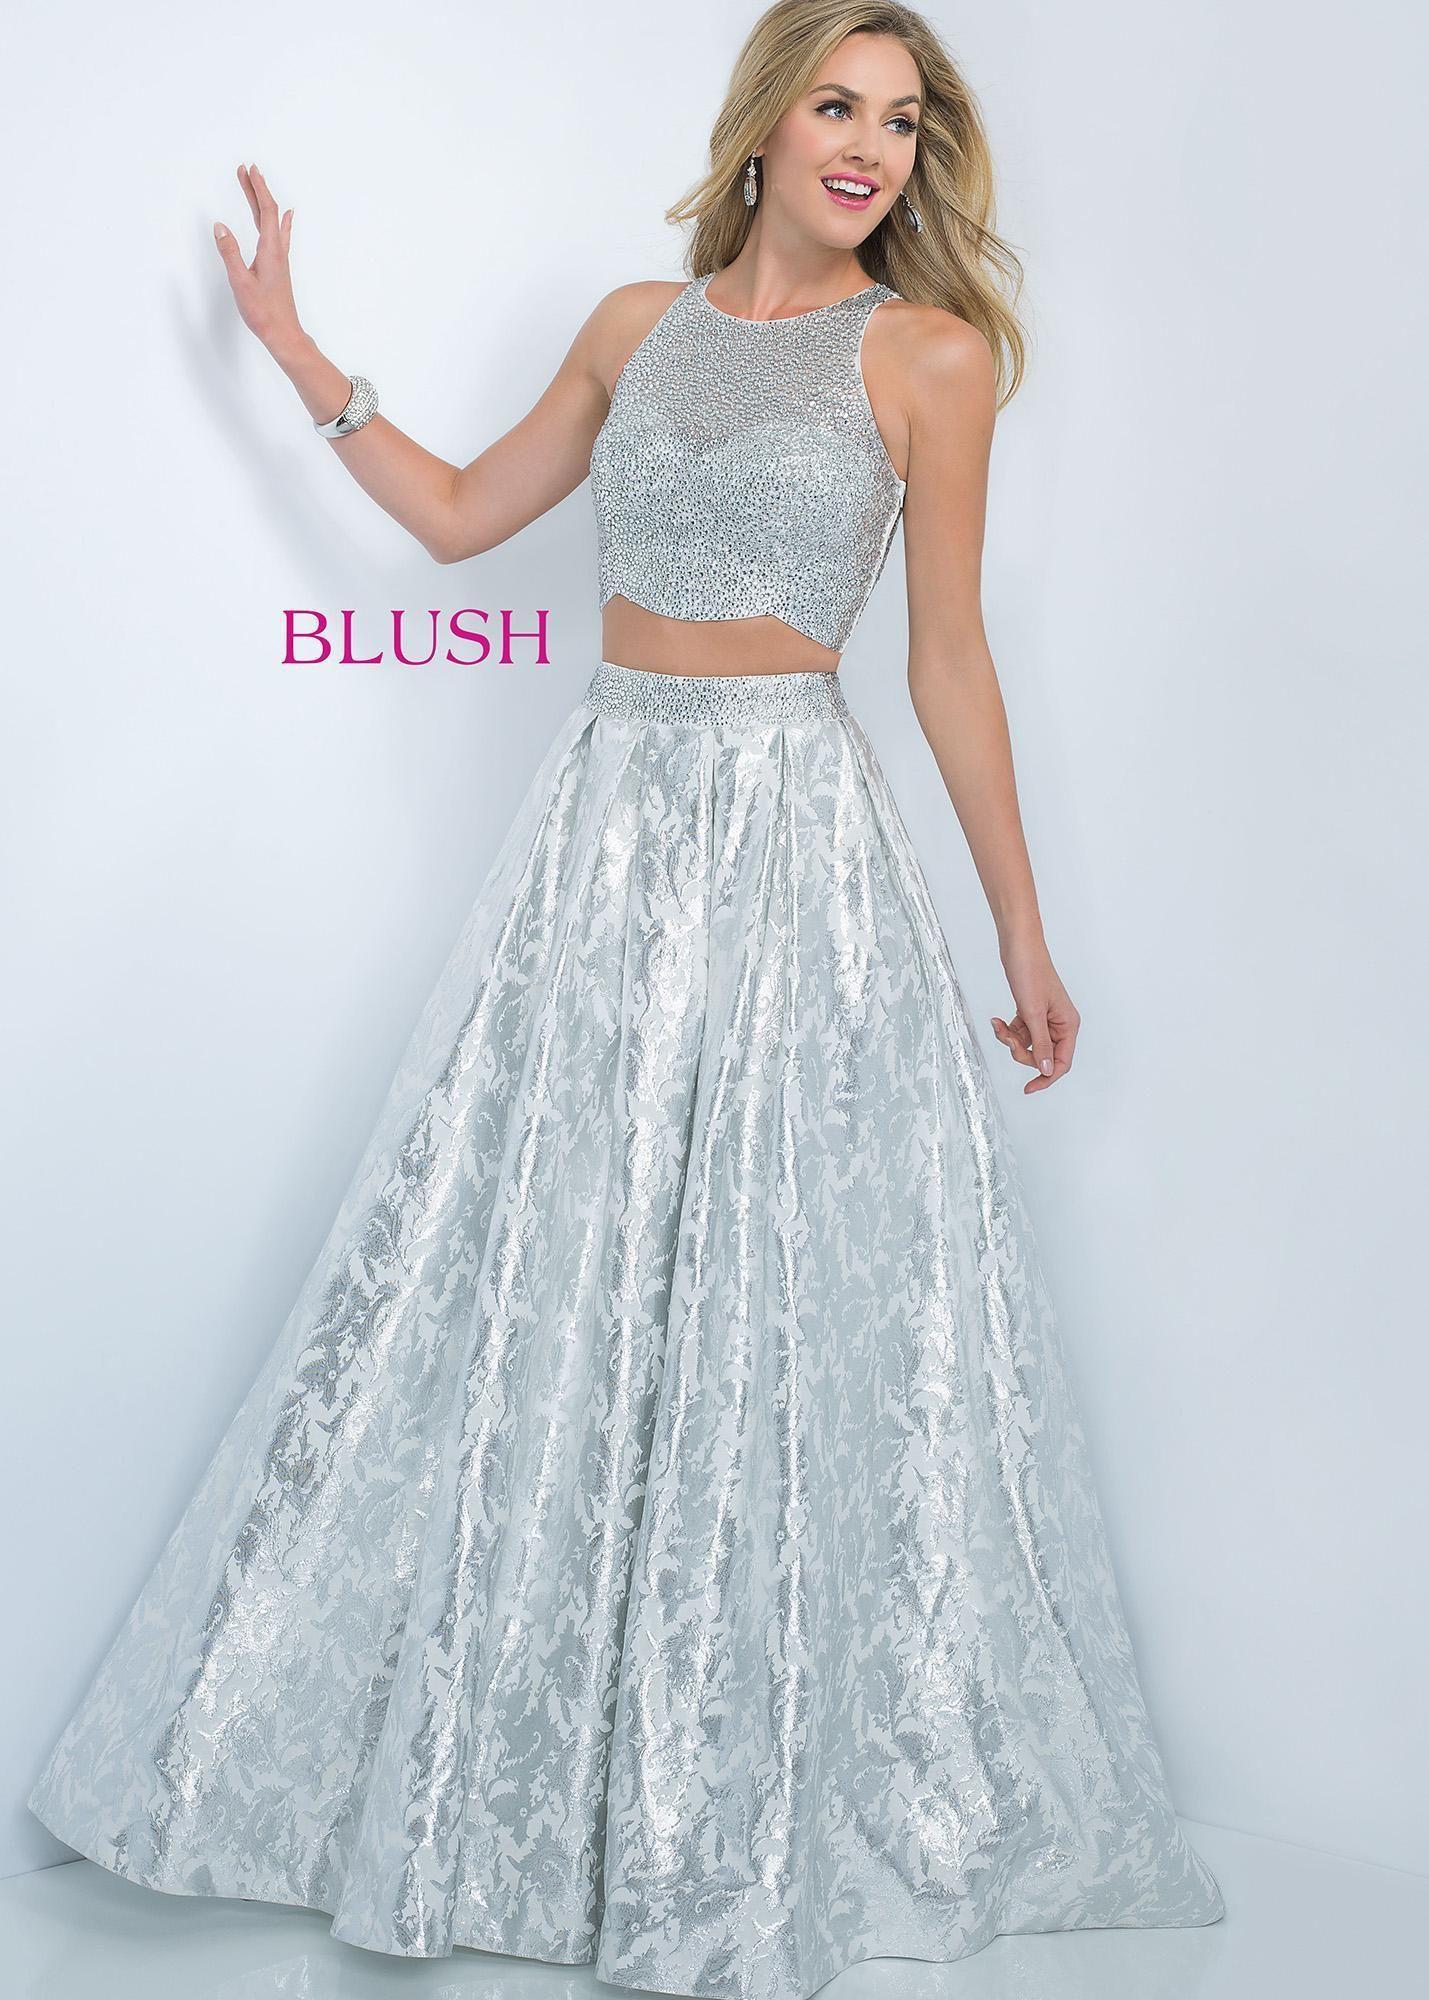 By Blush 5508 Shiny Metallic Two Piece Prom Dress | Prom Dresses ...